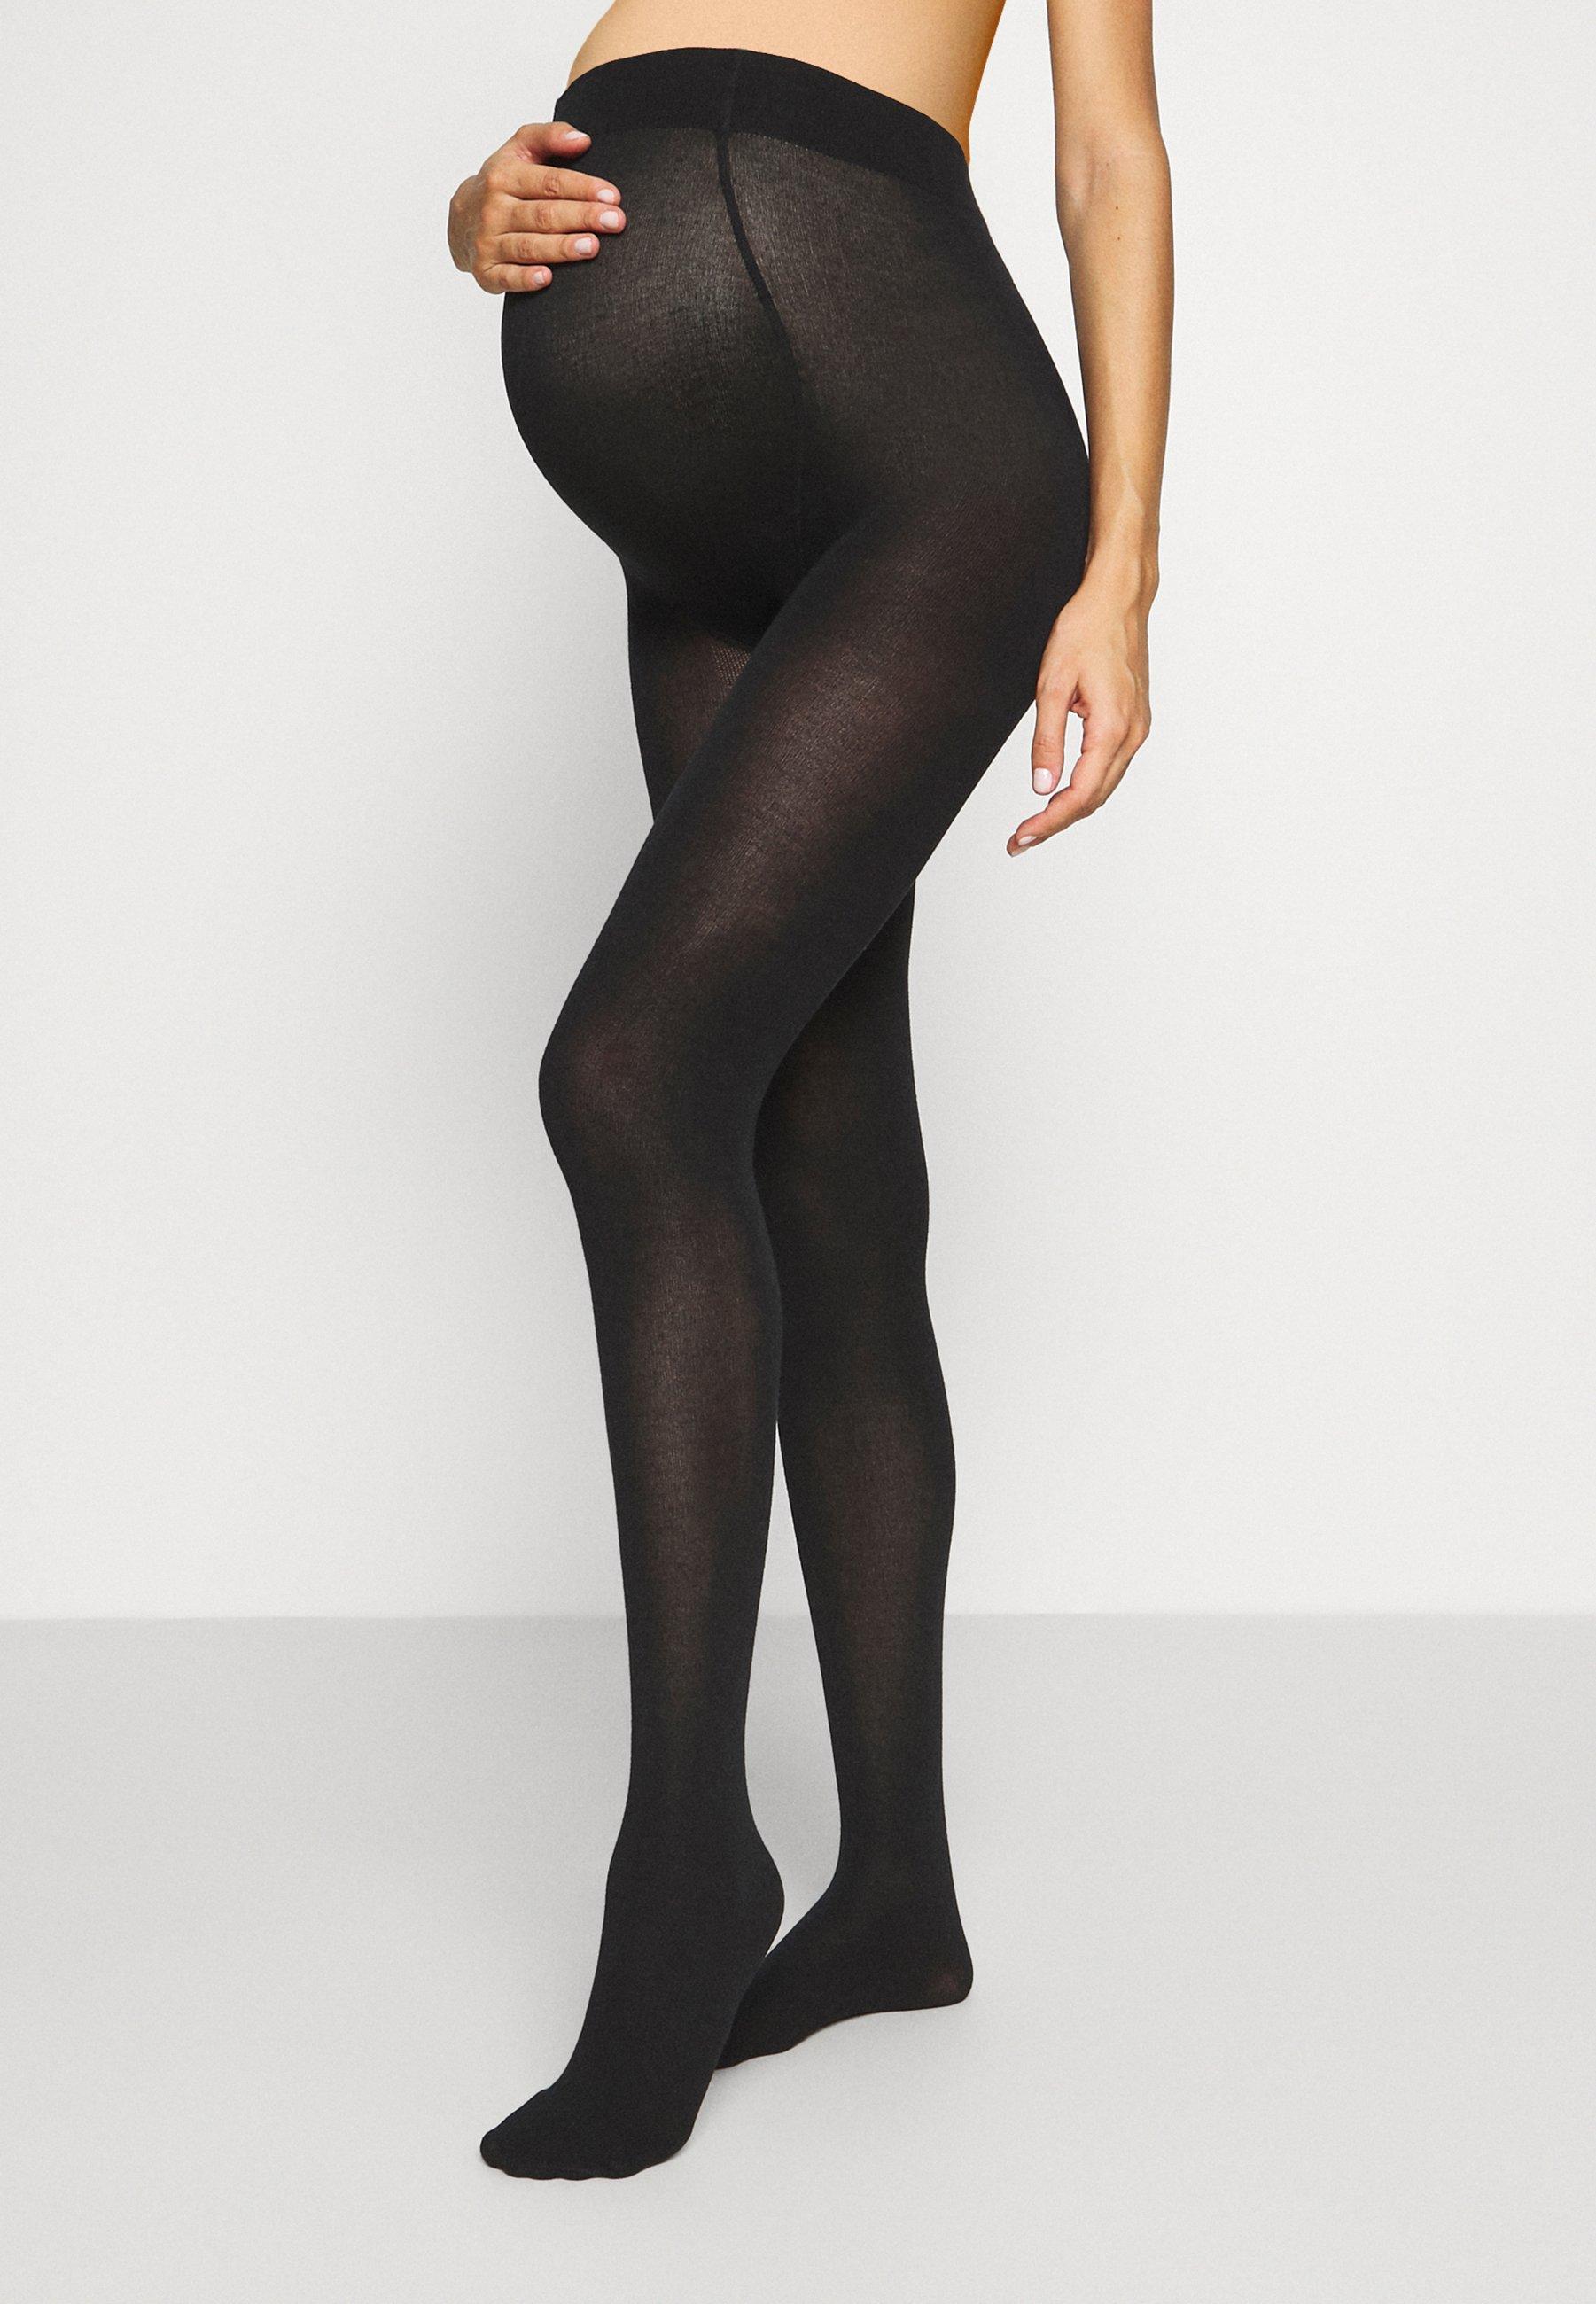 Femme MLJENNIE PANTYHOSE 2 PACK - Collants